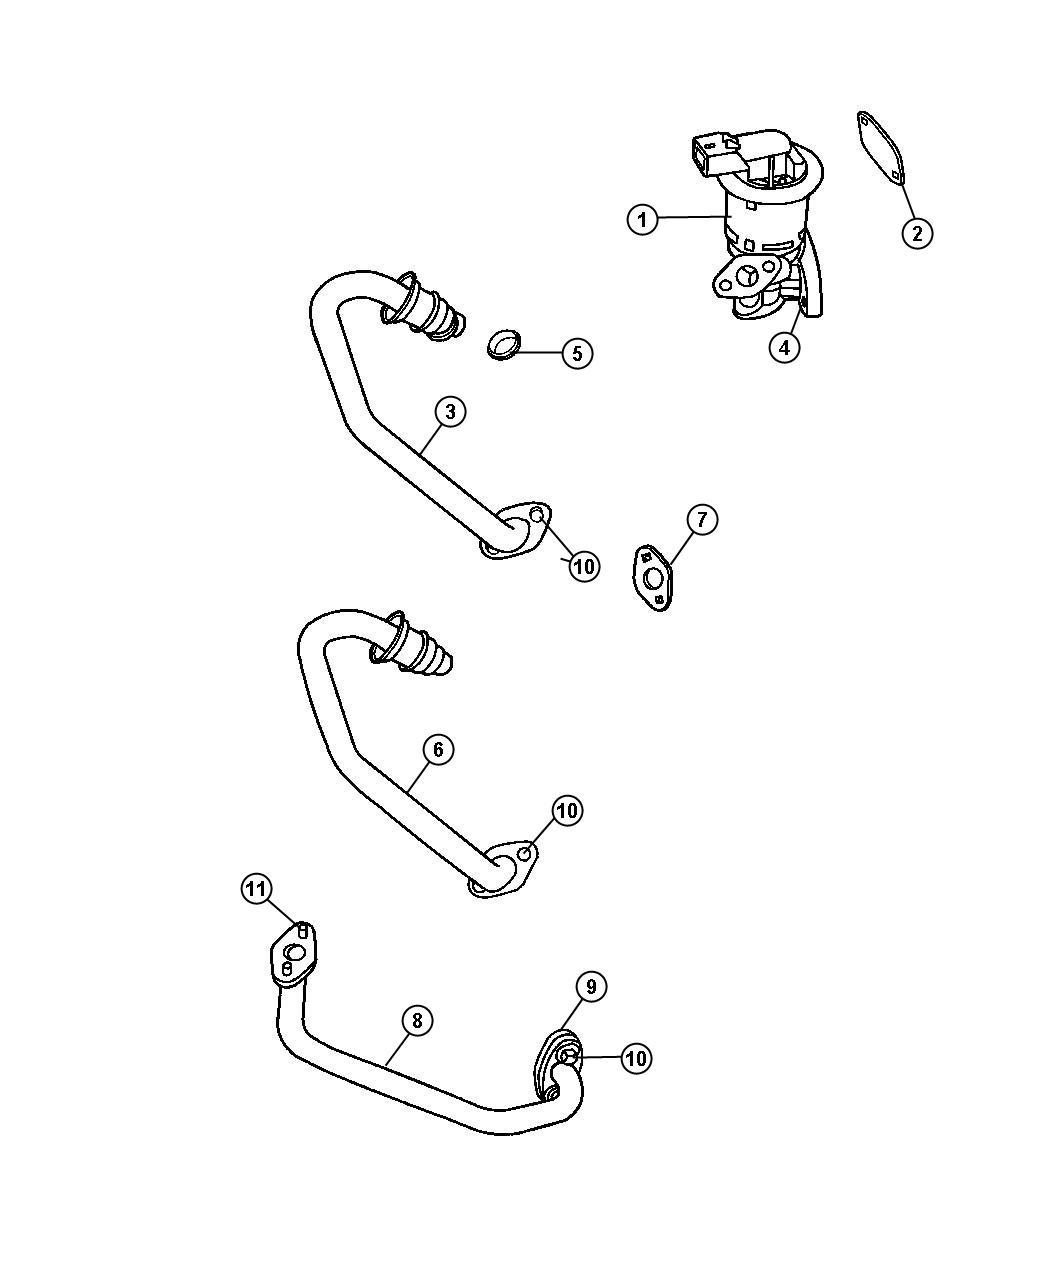 Dodge Charger Tube. Egr valve to intake plenum